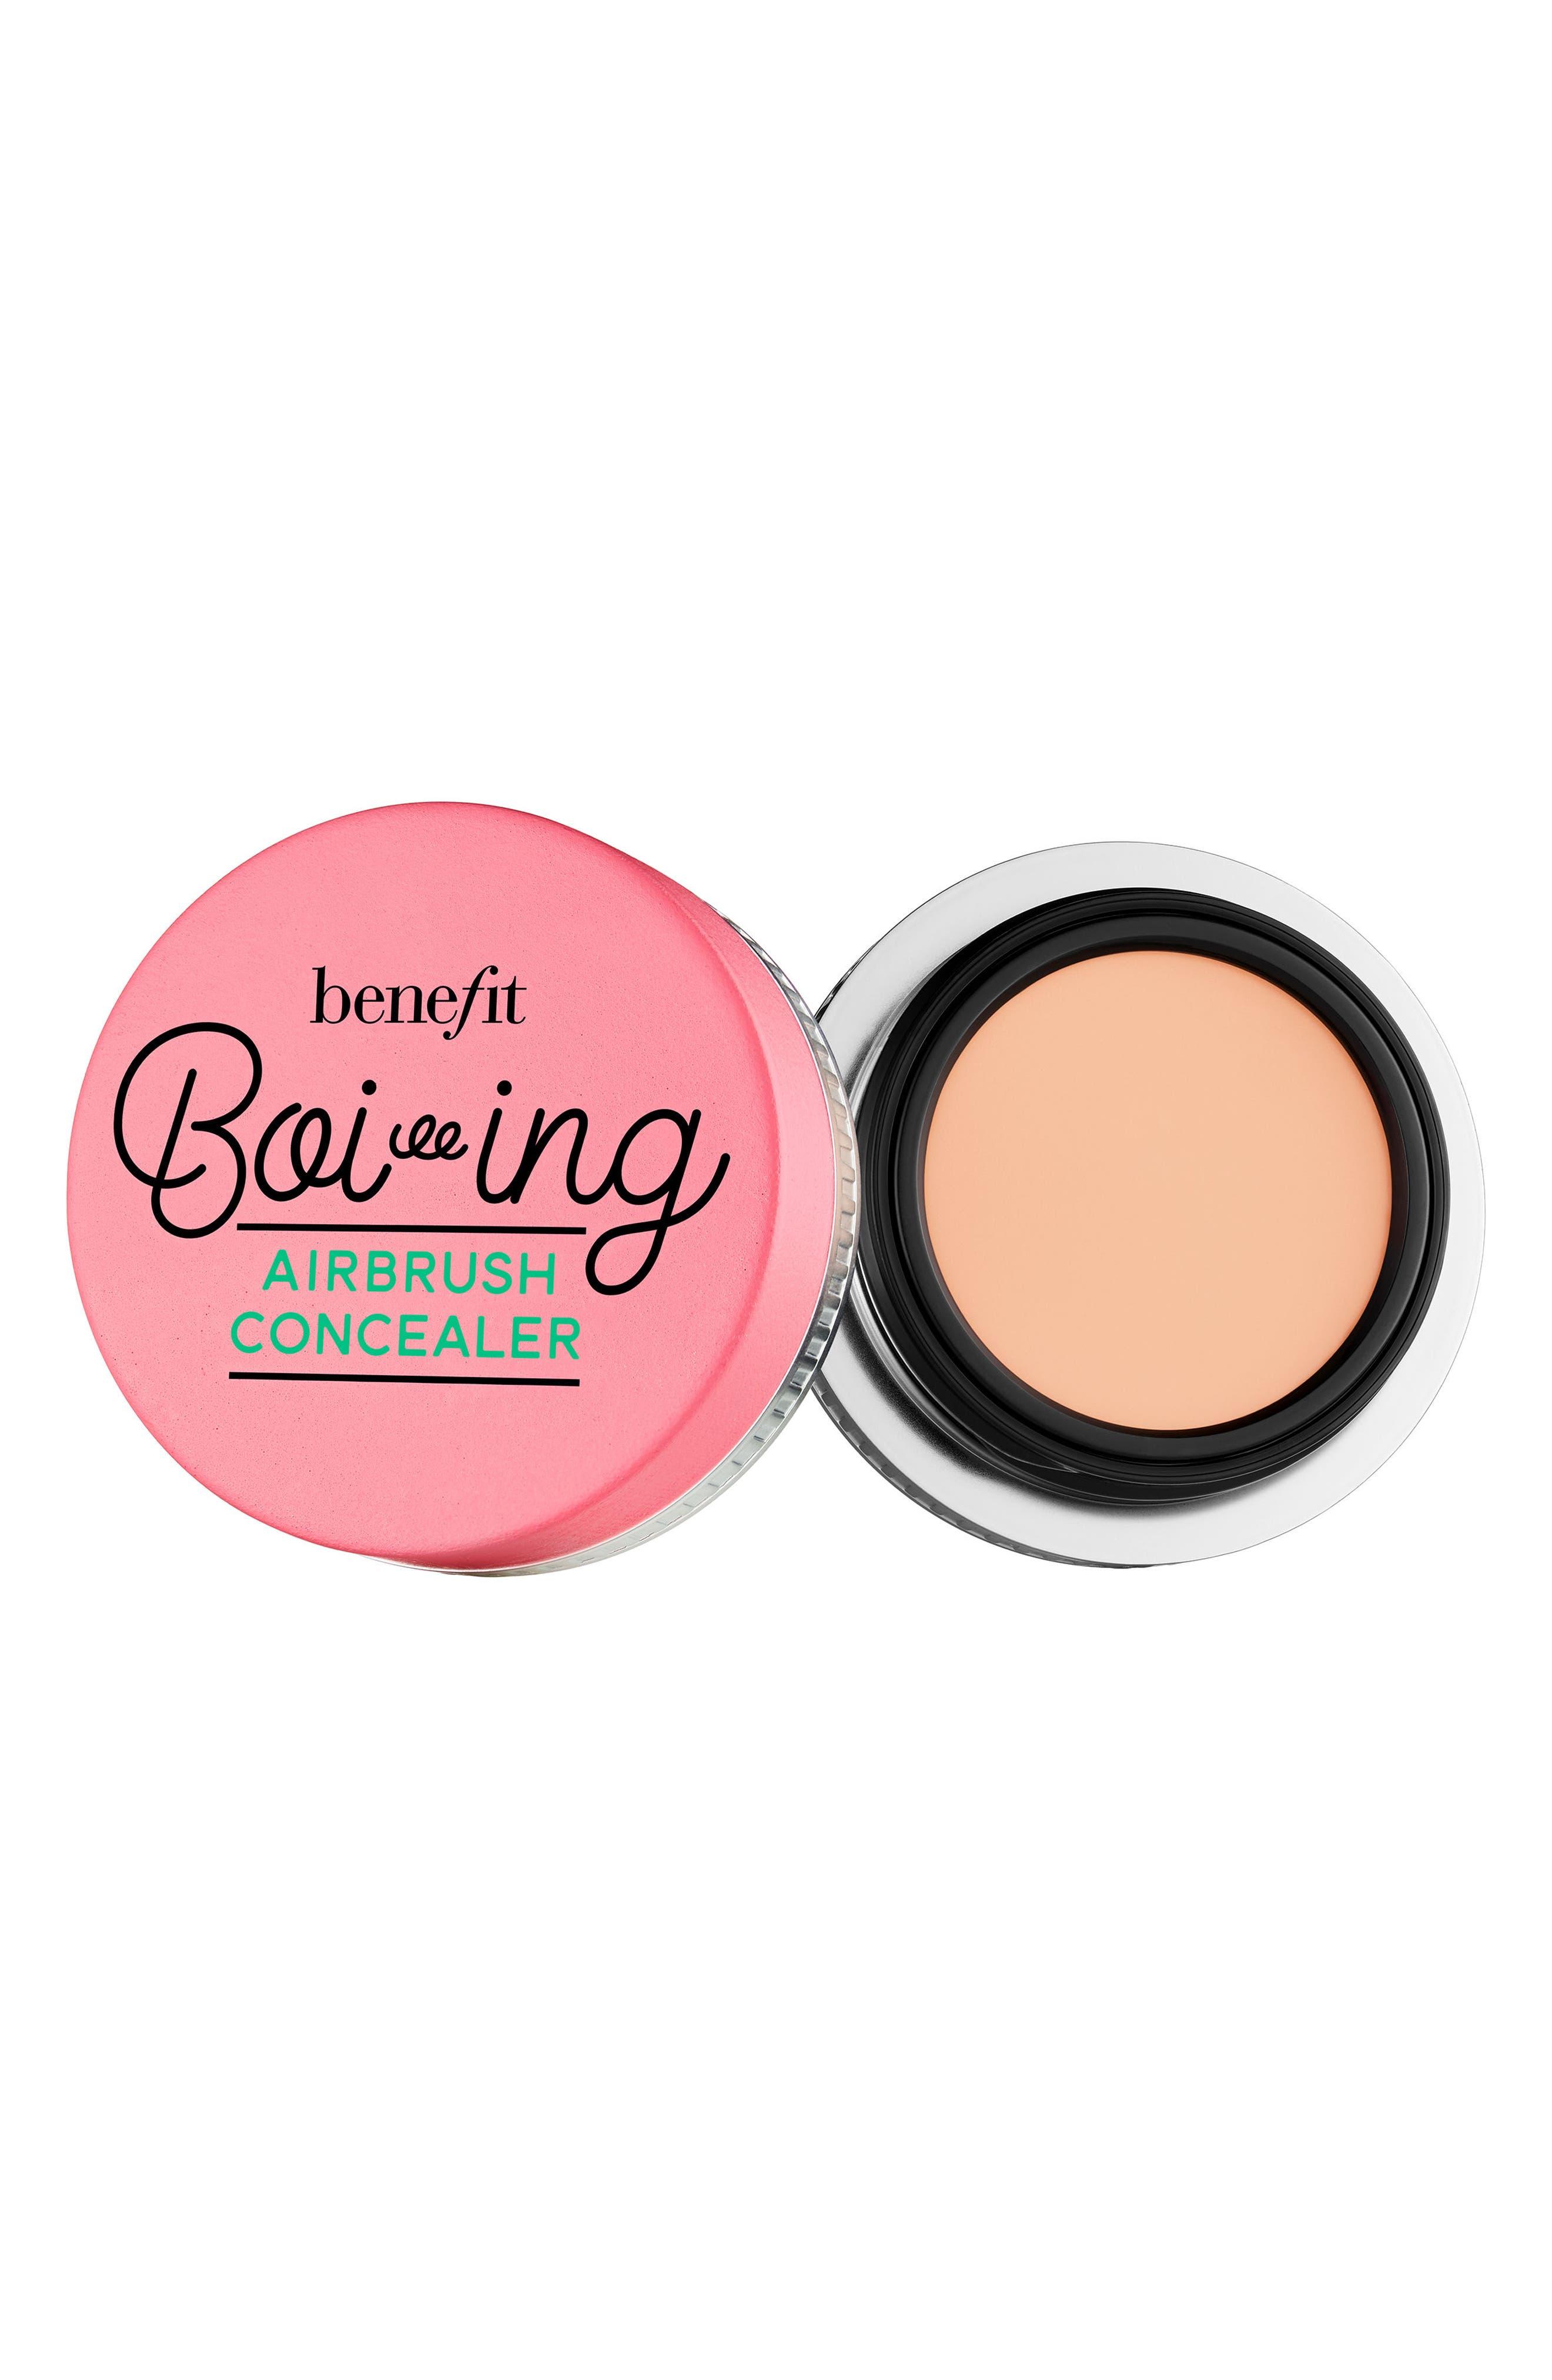 Benefit Boi-ing Airbrush Concealer,                             Main thumbnail 1, color,                             01 - Light